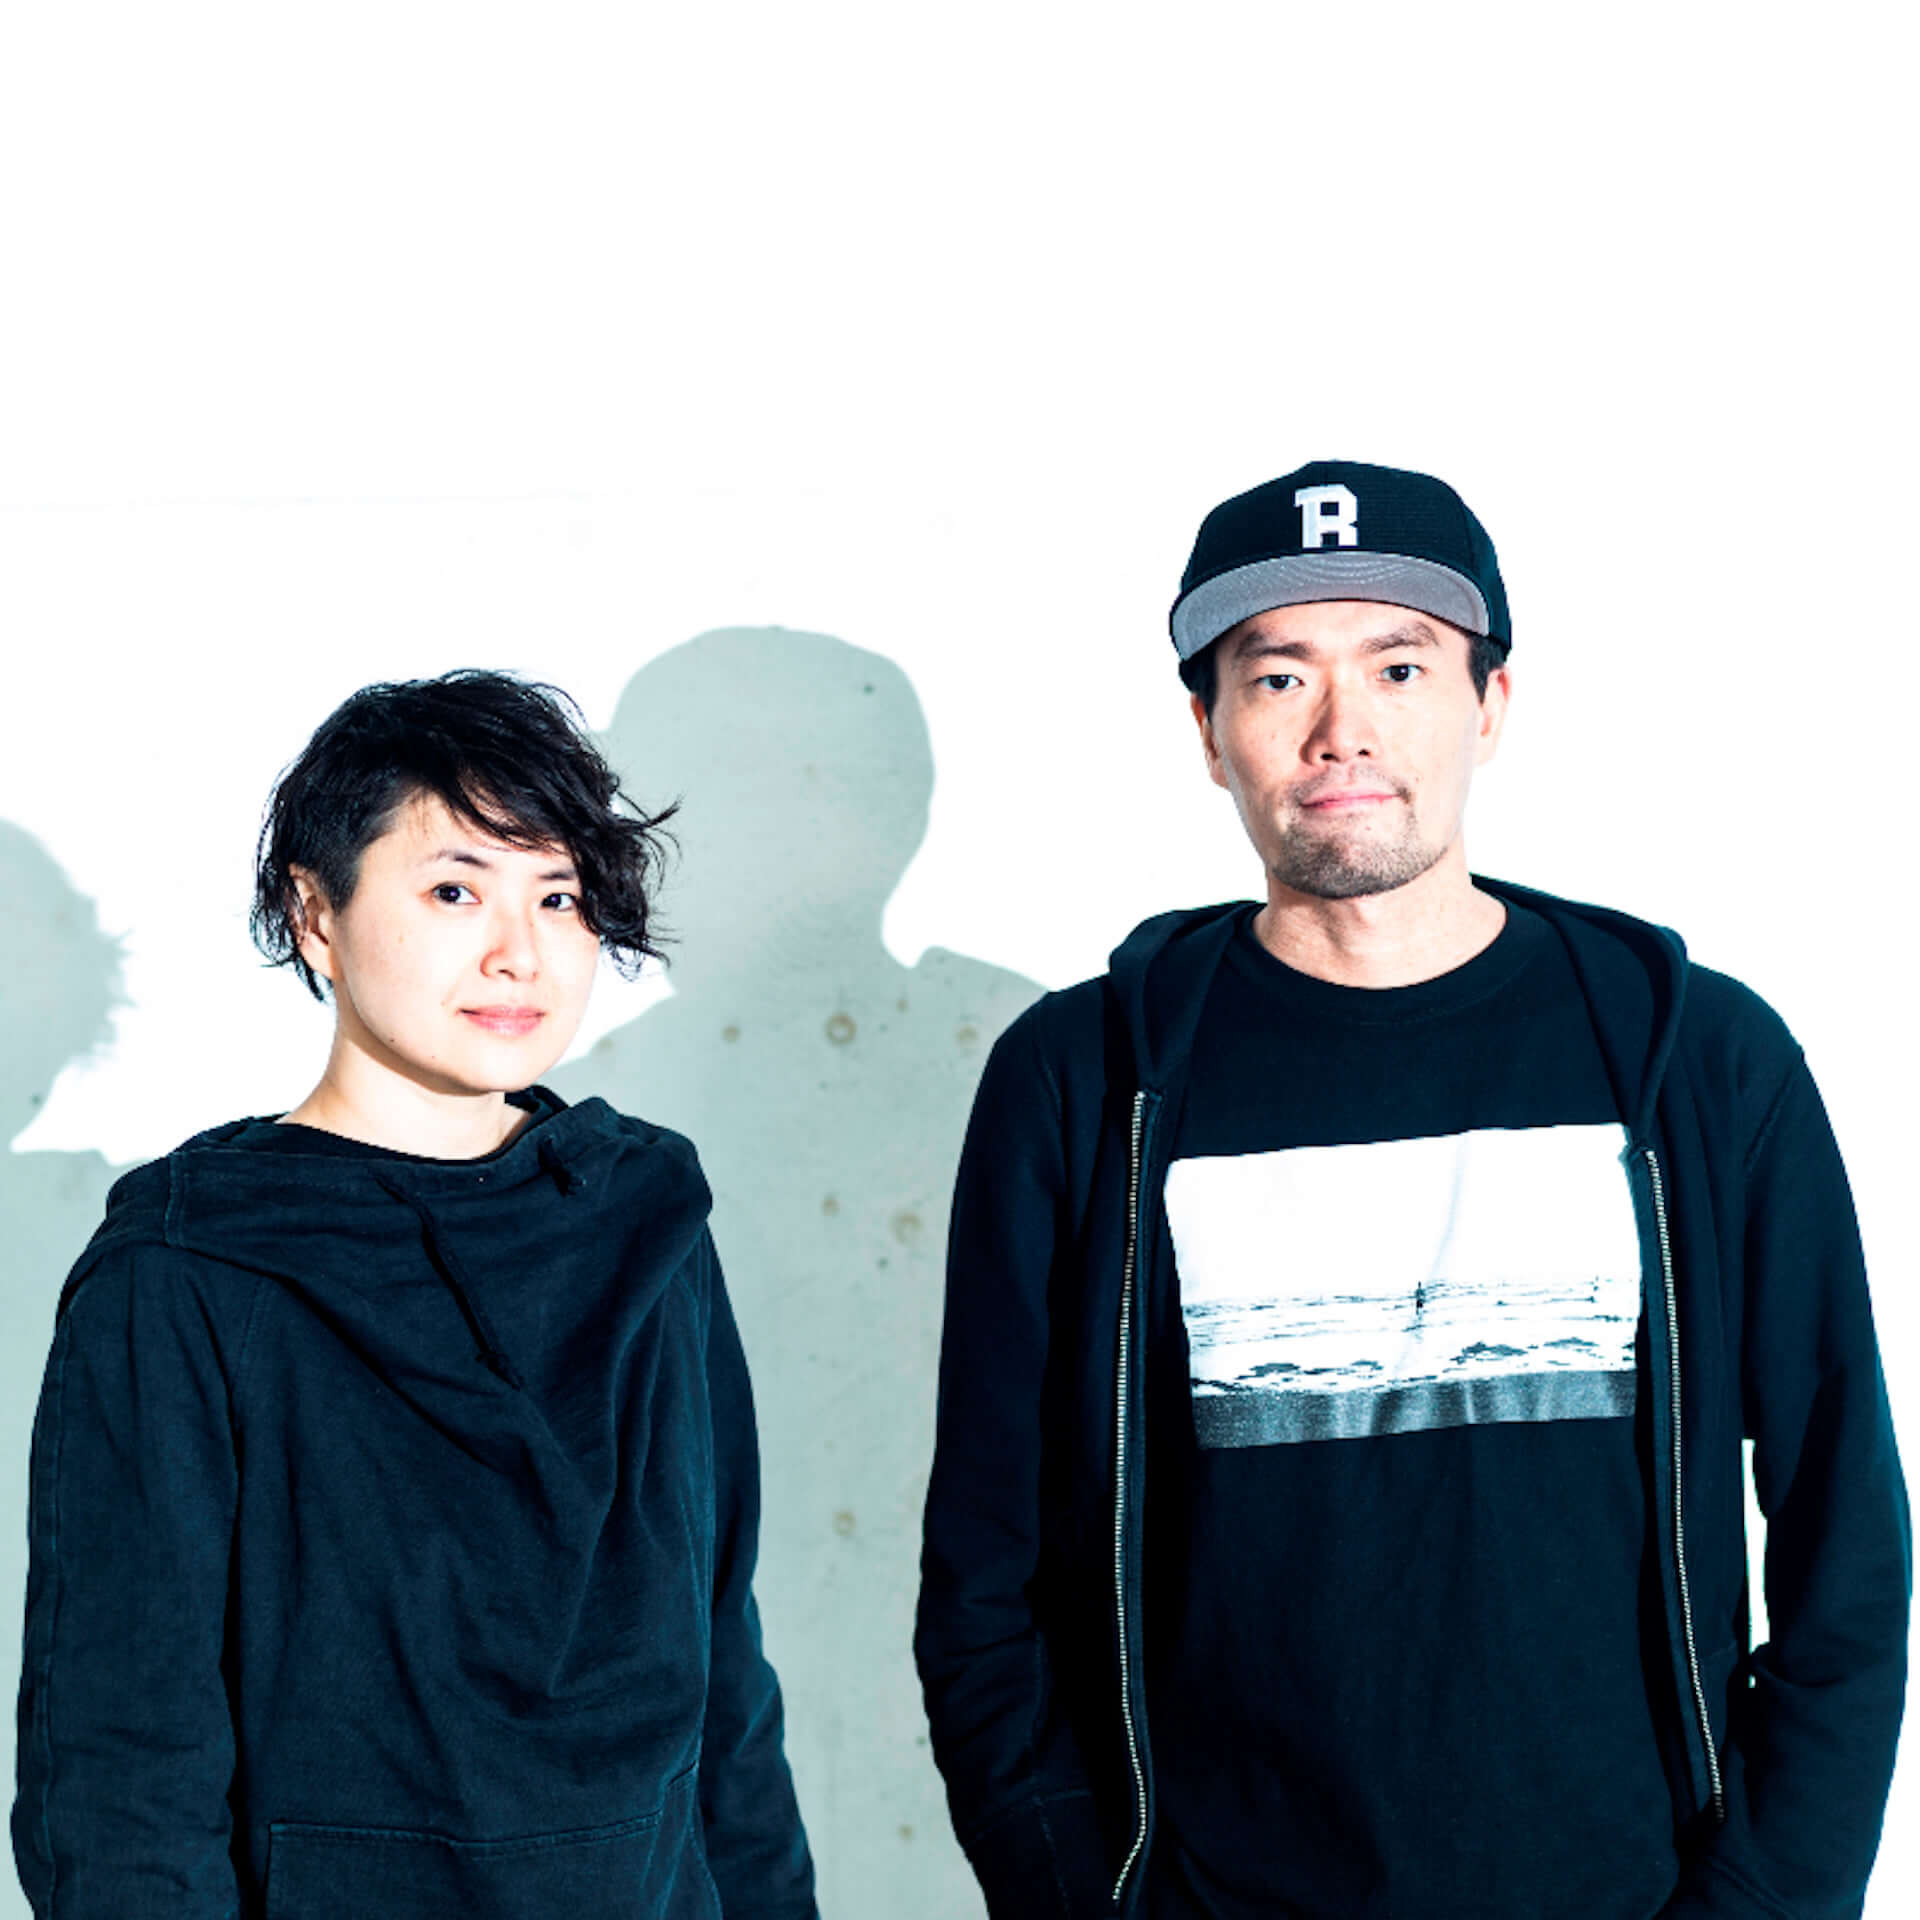 Dazzle Drums主催ハウスパーティー<Music Of Many Colours>が渋谷Contactで開催決定!DJ Azusa、TOYODAらが登場 music201112_contact_1-1920x1920